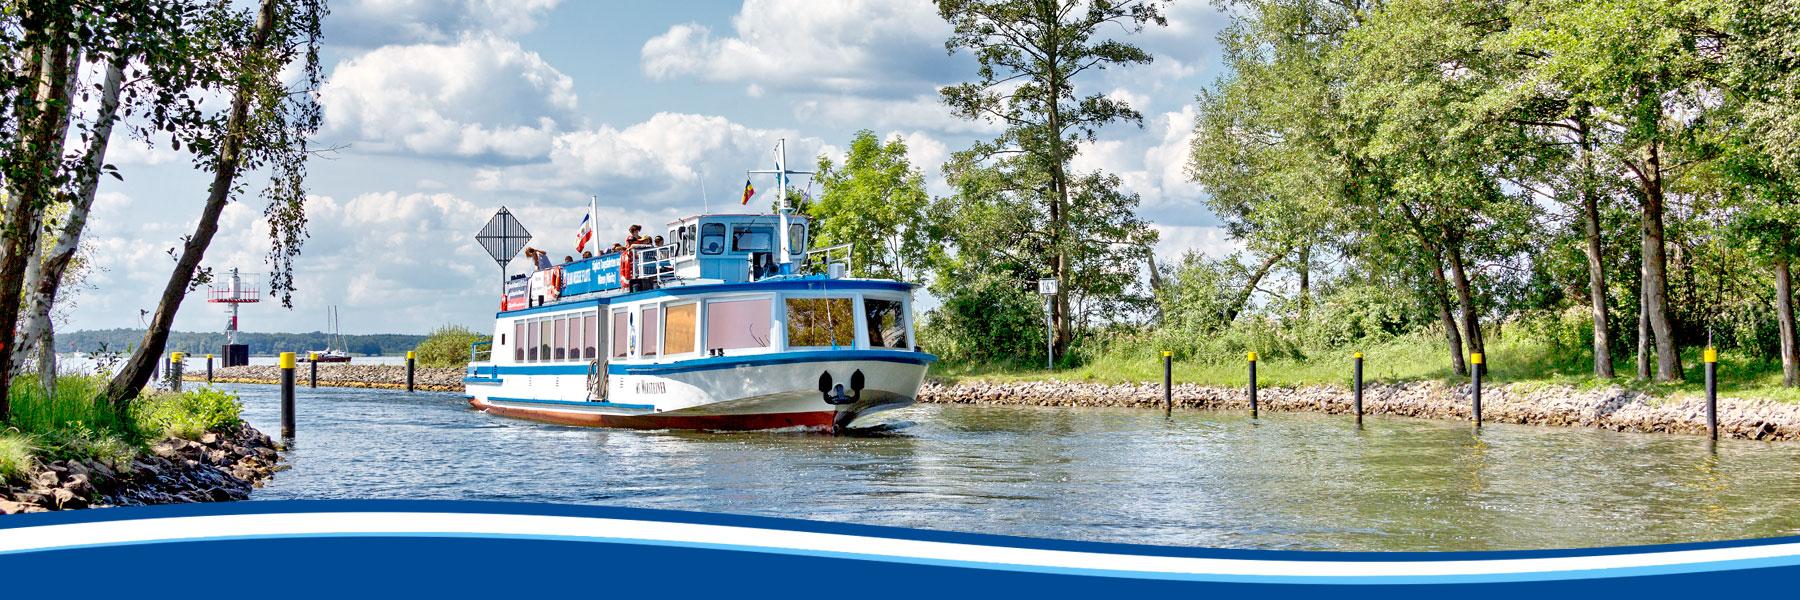 Tour - Blau Weisse Flotte Müritz & Seen in Malchow